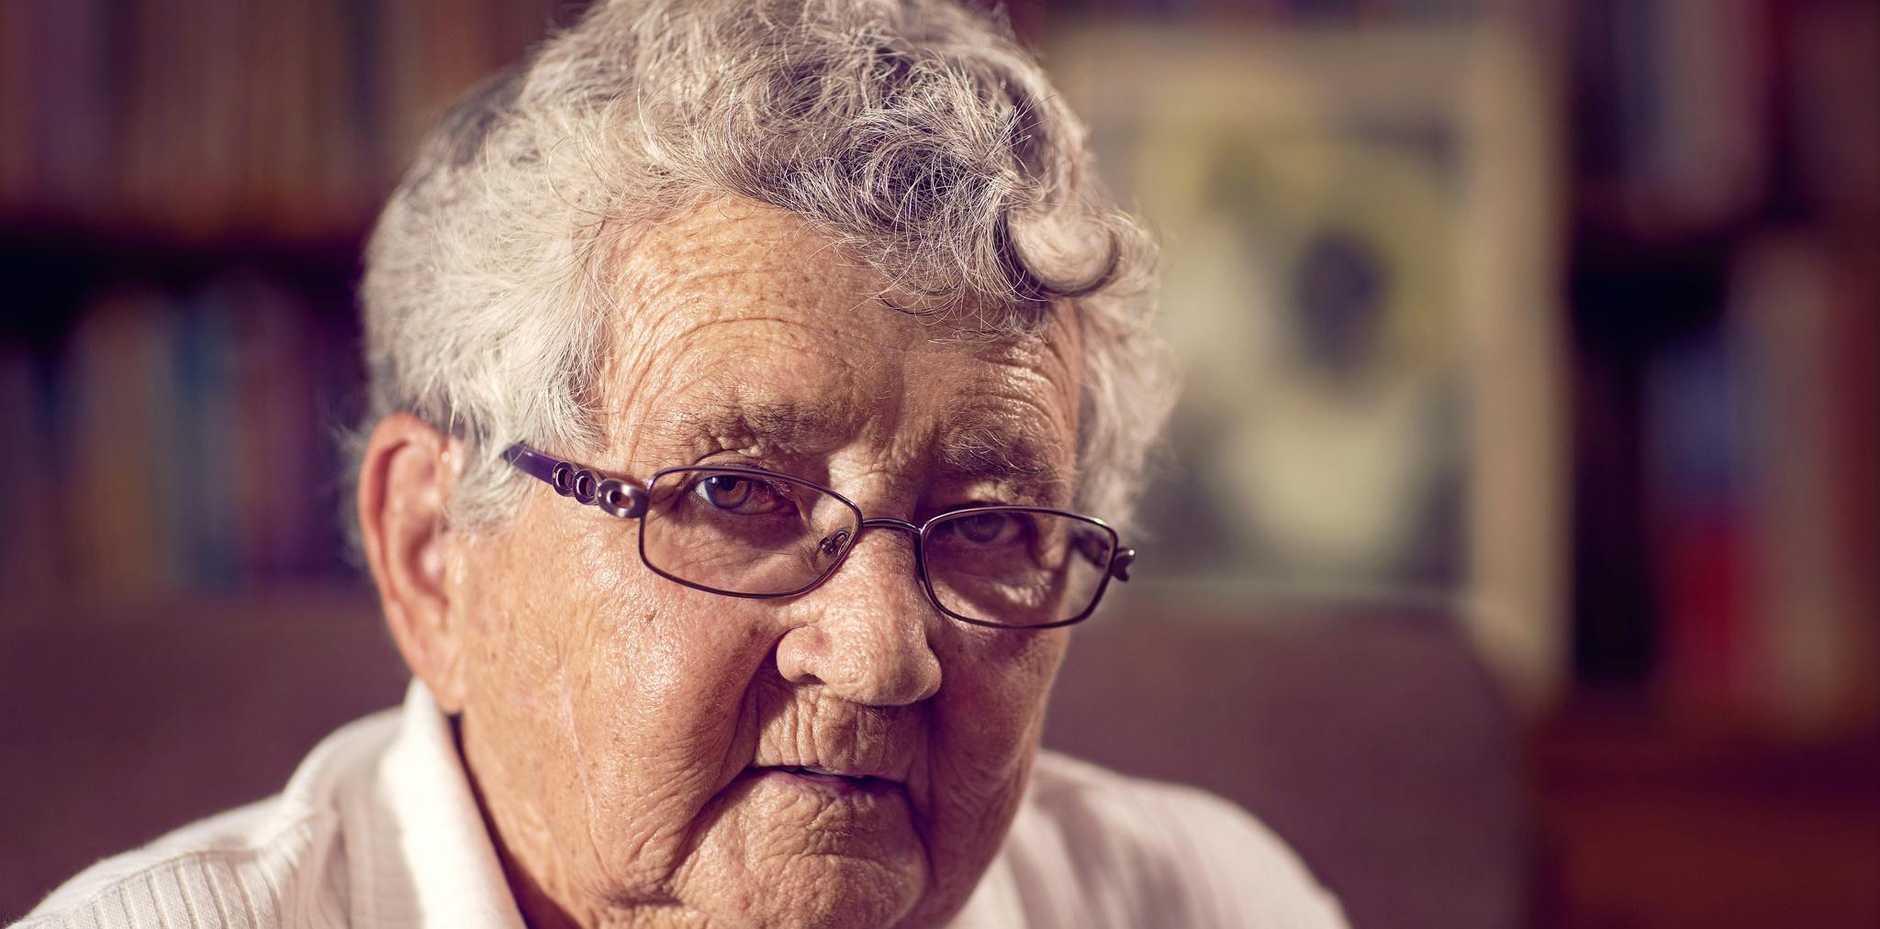 Senior Australian of the Year Award 2017 national finalist, Sister Anne Gardiner AM.